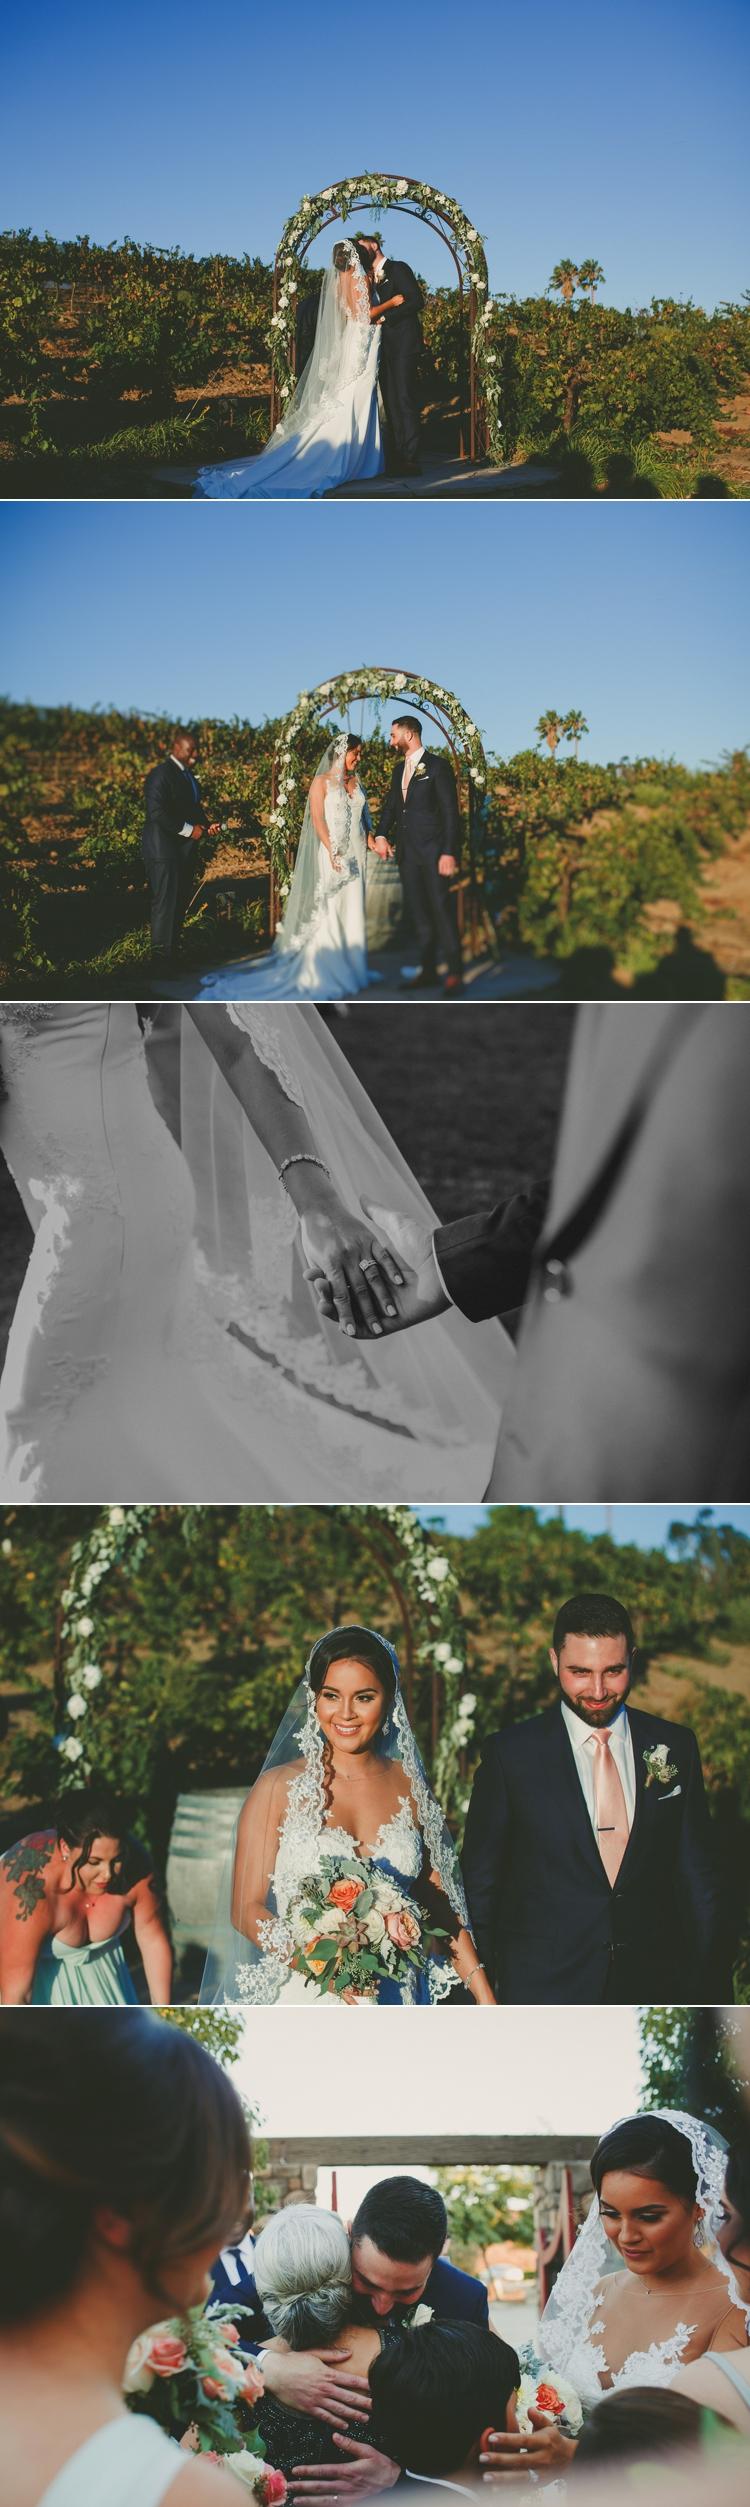 europa-village-winery-wedding-9